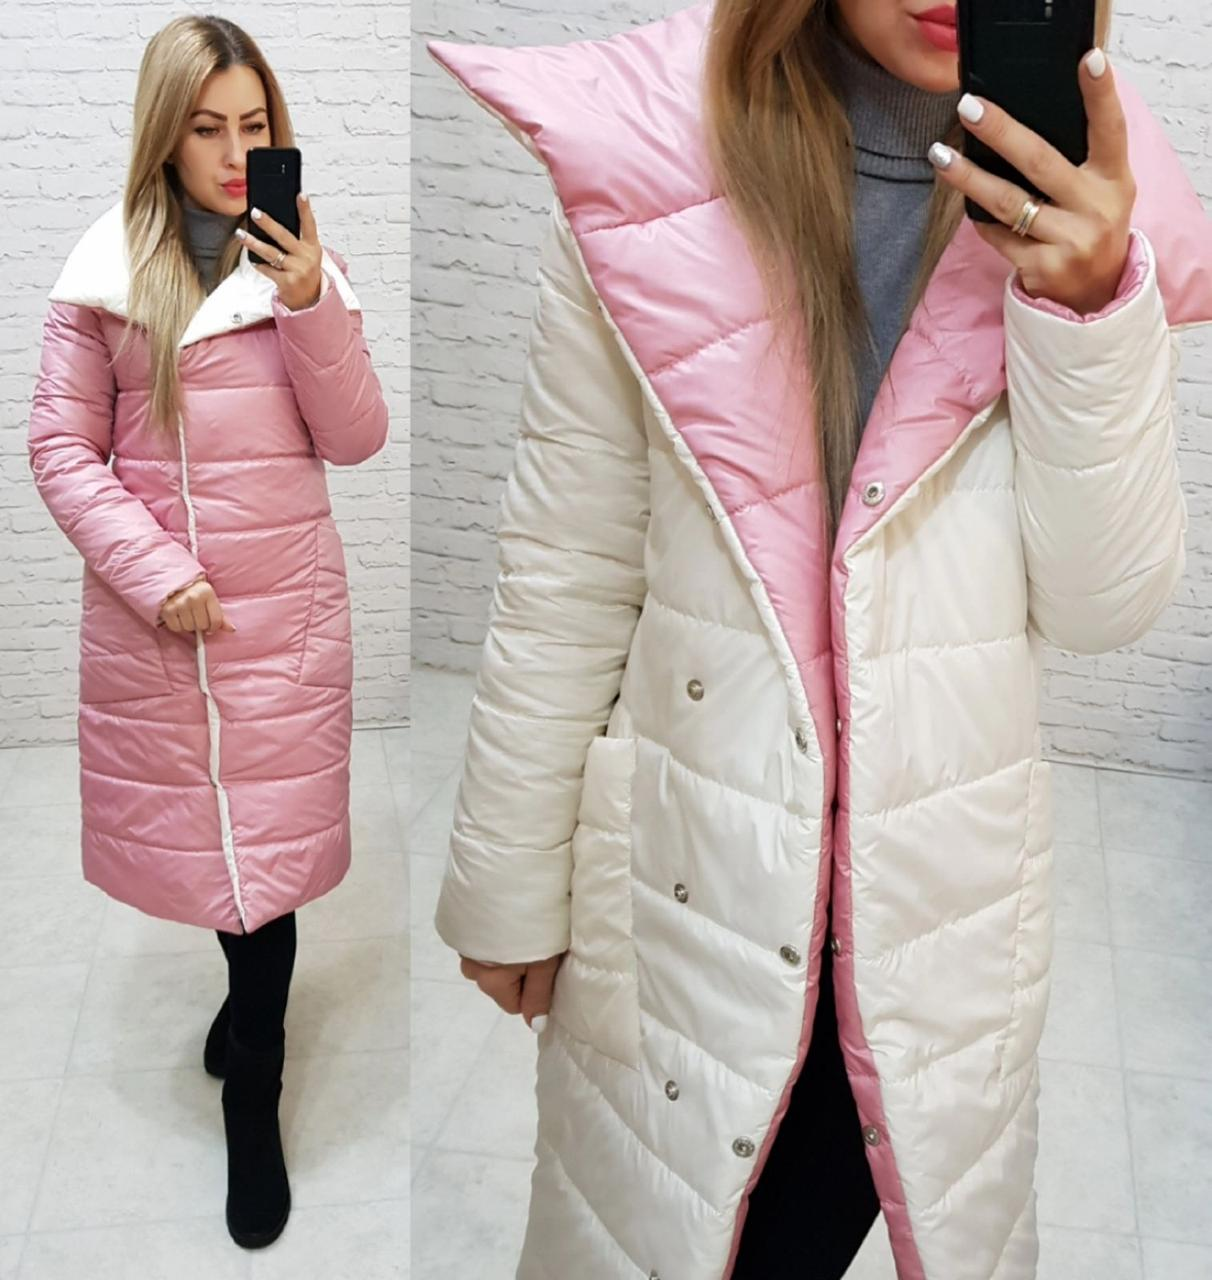 Куртка одеяло демисезон двухсторонняя арт. 1006 пудра + белый / белый с розовым